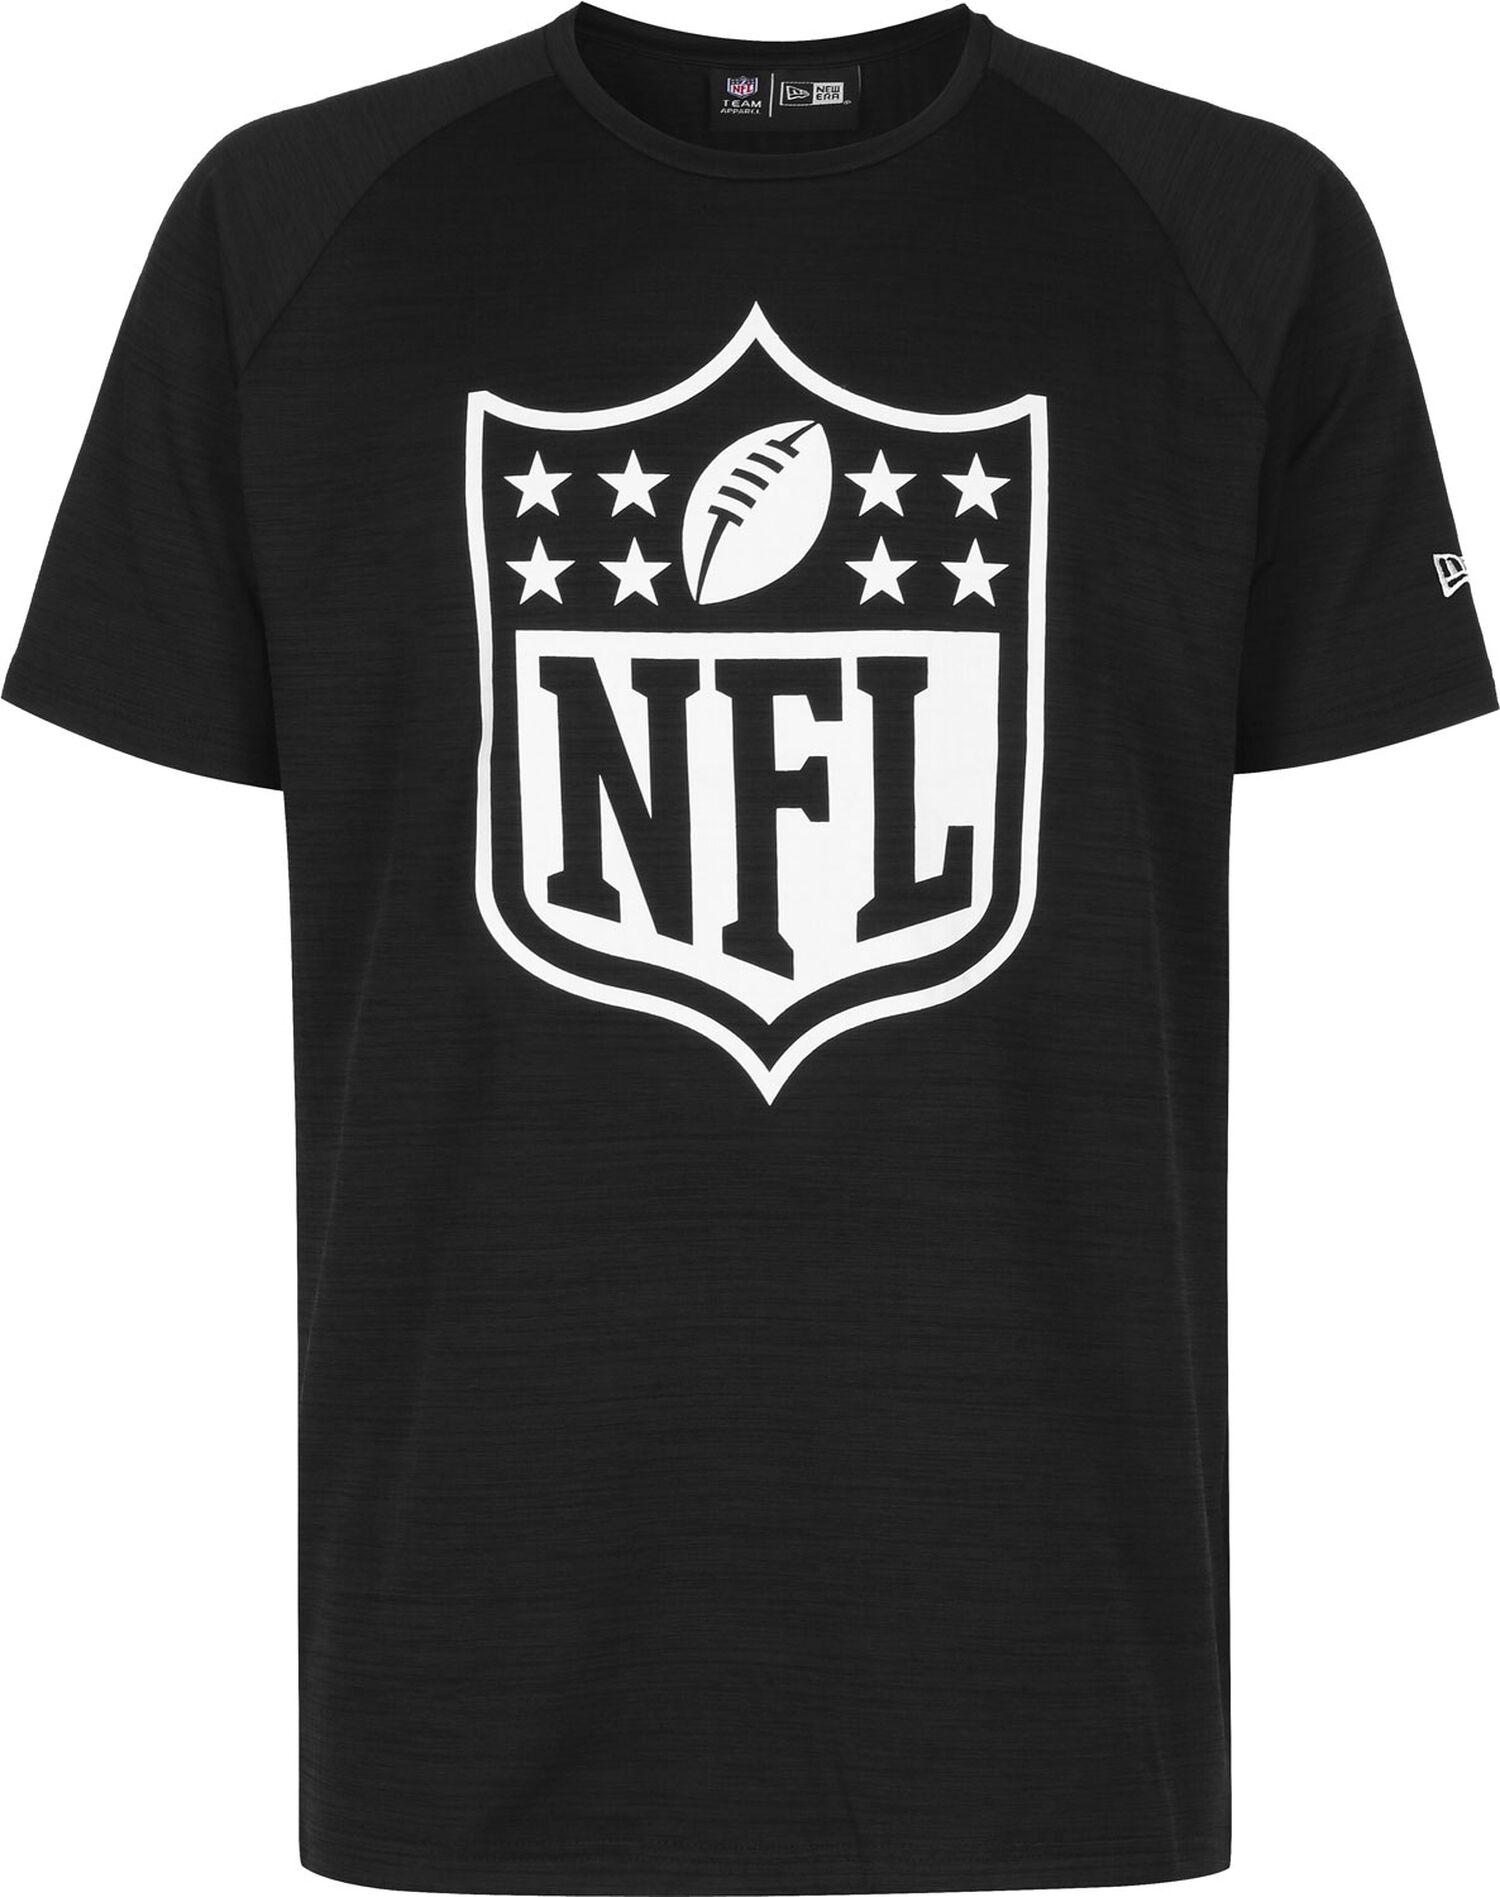 NFL Engineered Raglan Generic Logo